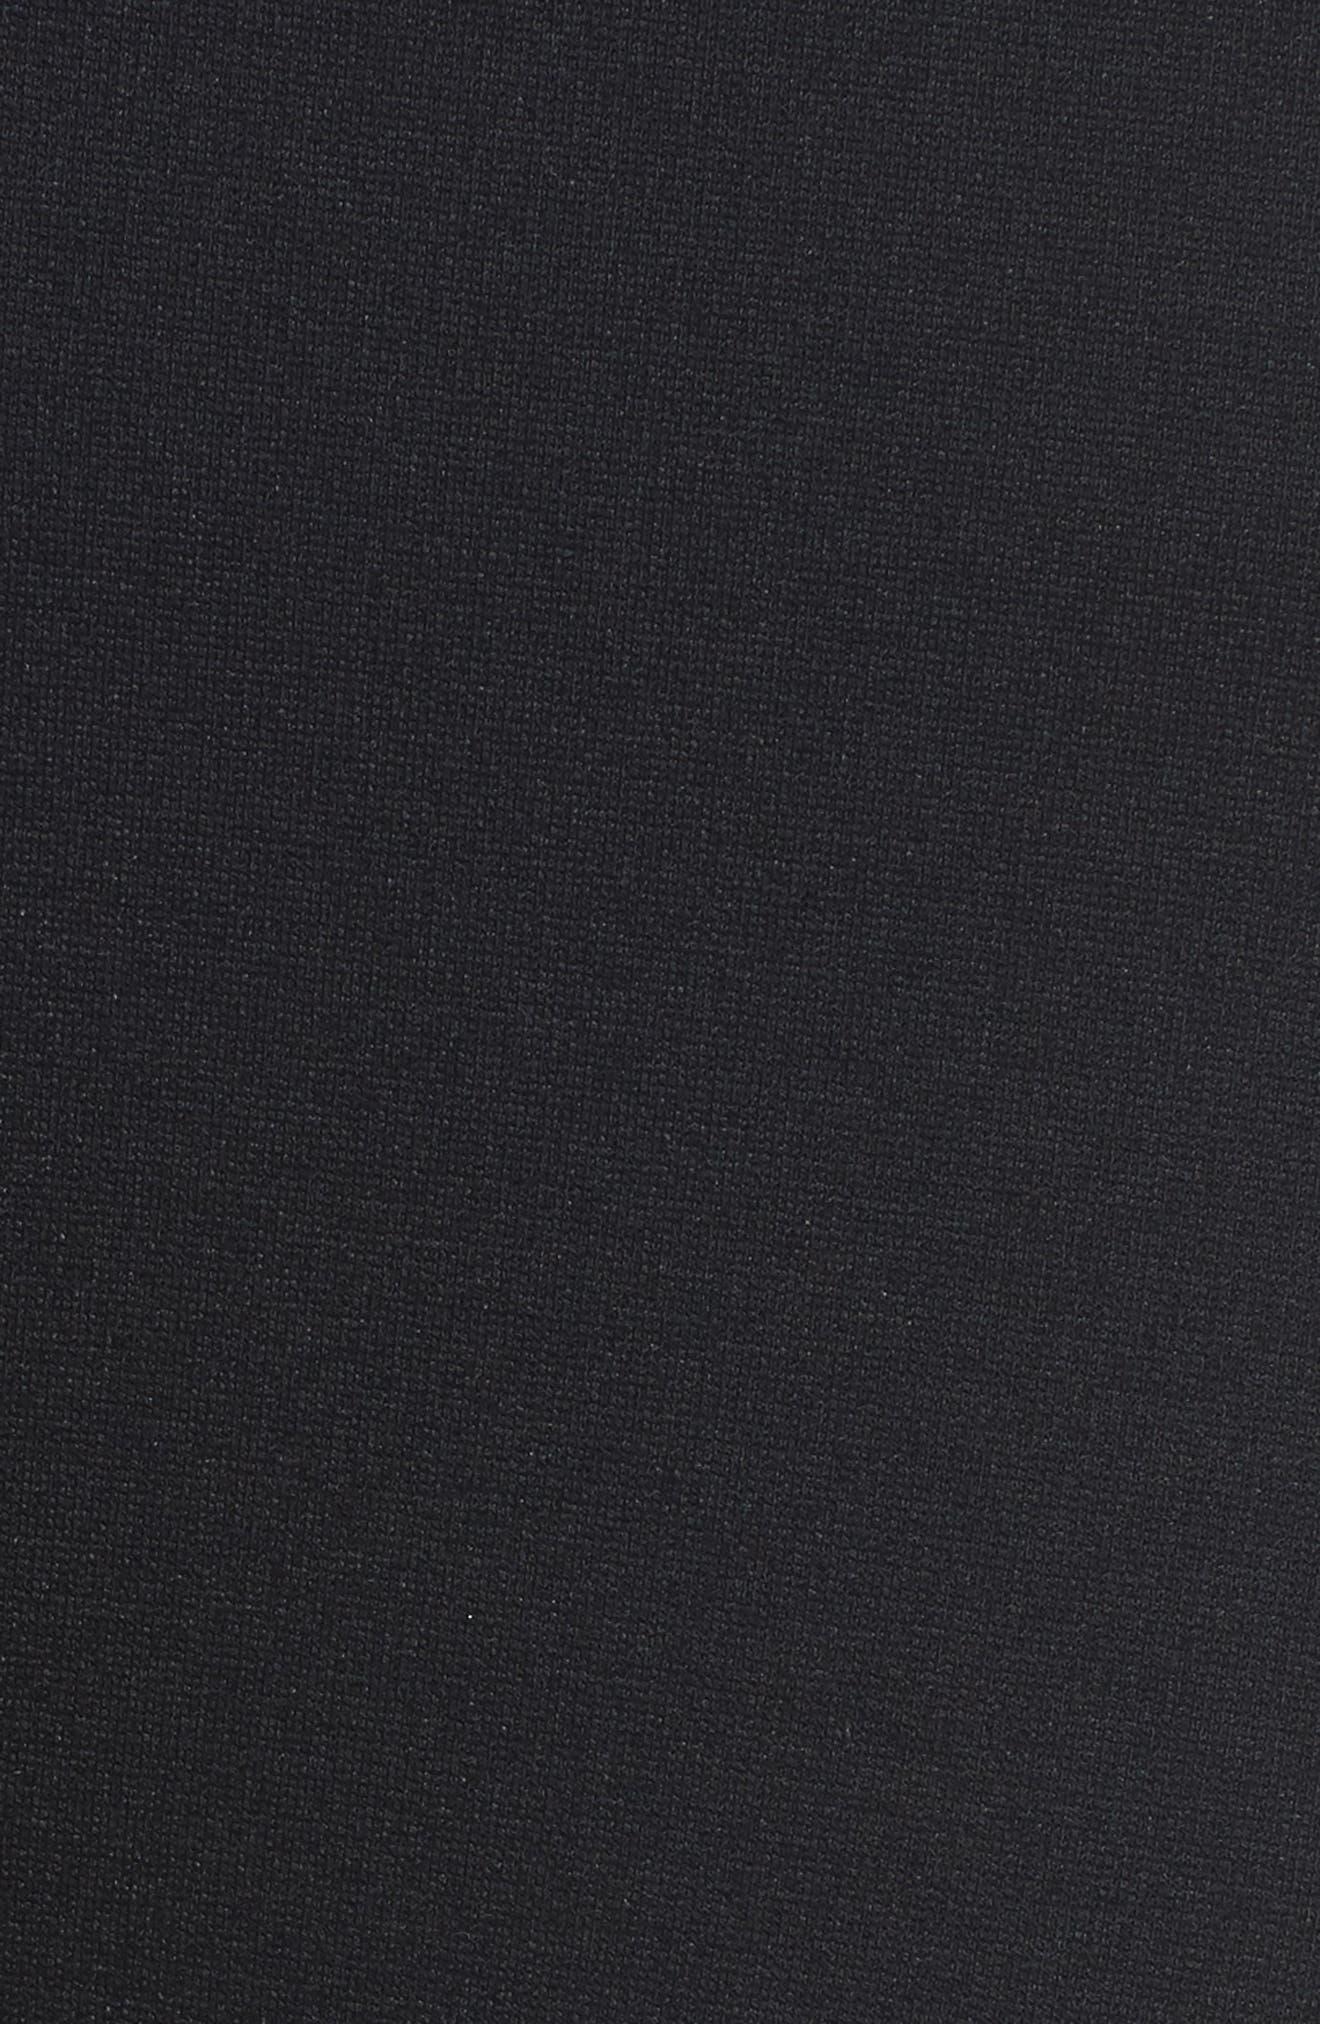 Faux Leather Chevron Panel Ponte Leggings,                             Alternate thumbnail 5, color,                             006